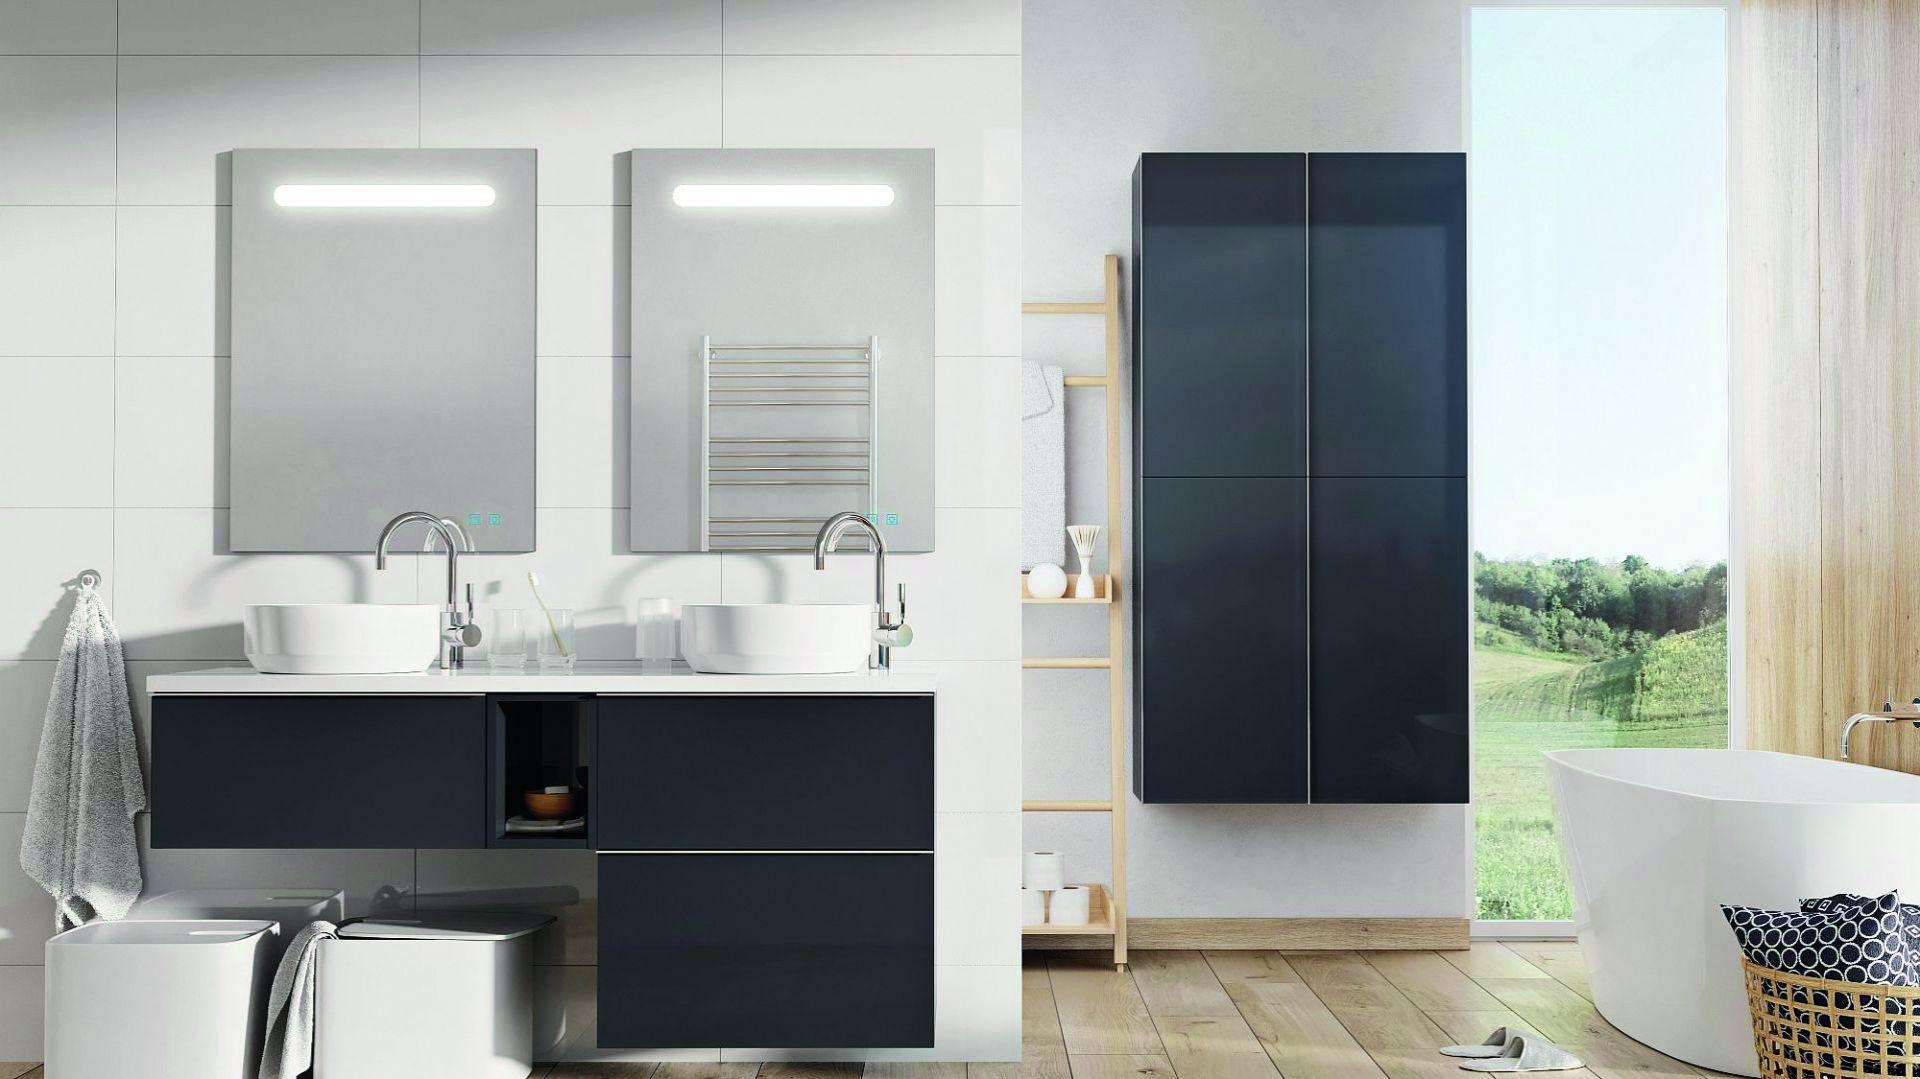 Kolekcja mebli łazienkowych Look marki Elita. Fot. Elita